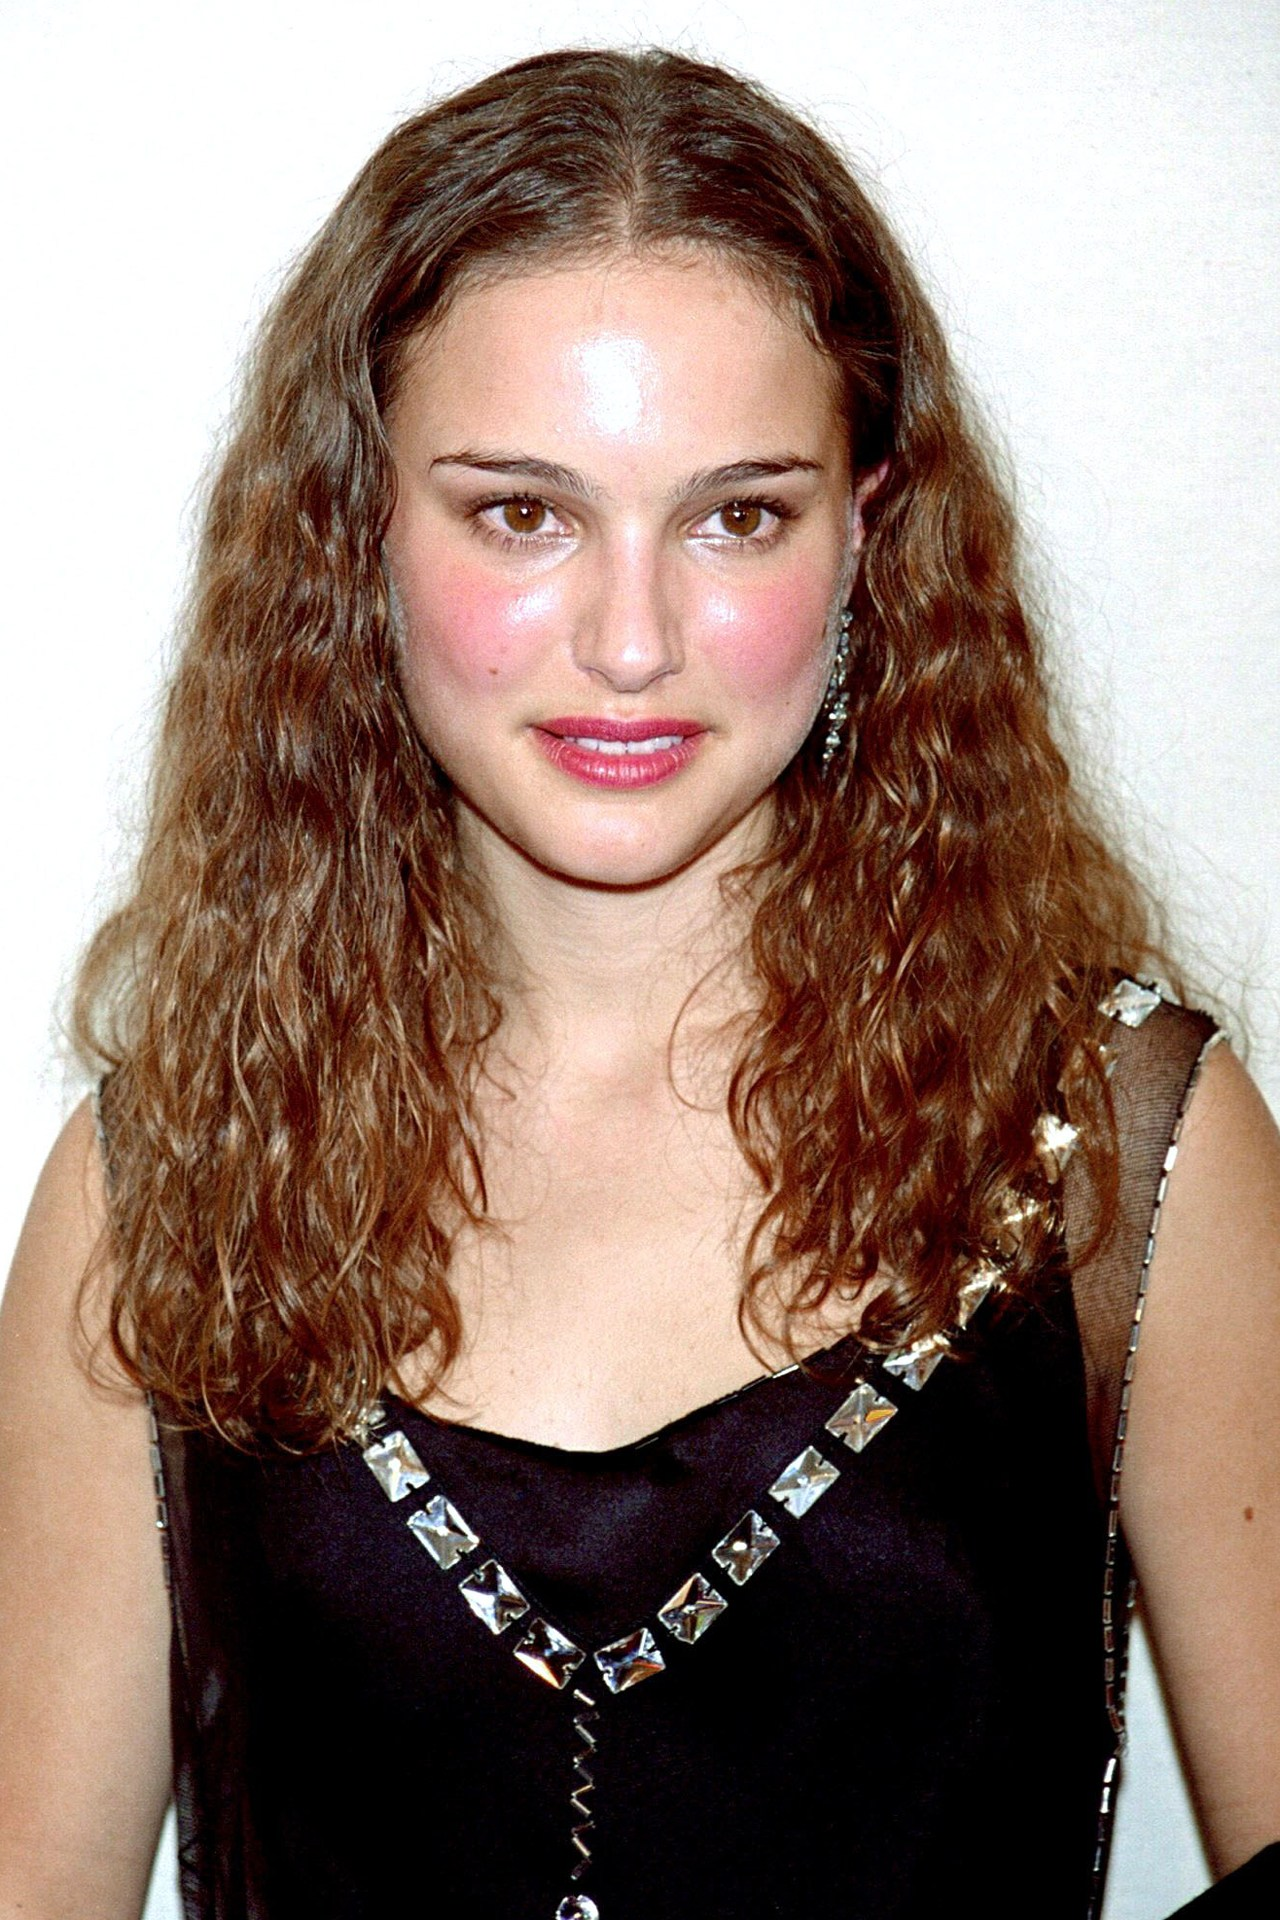 Natalie portman younger